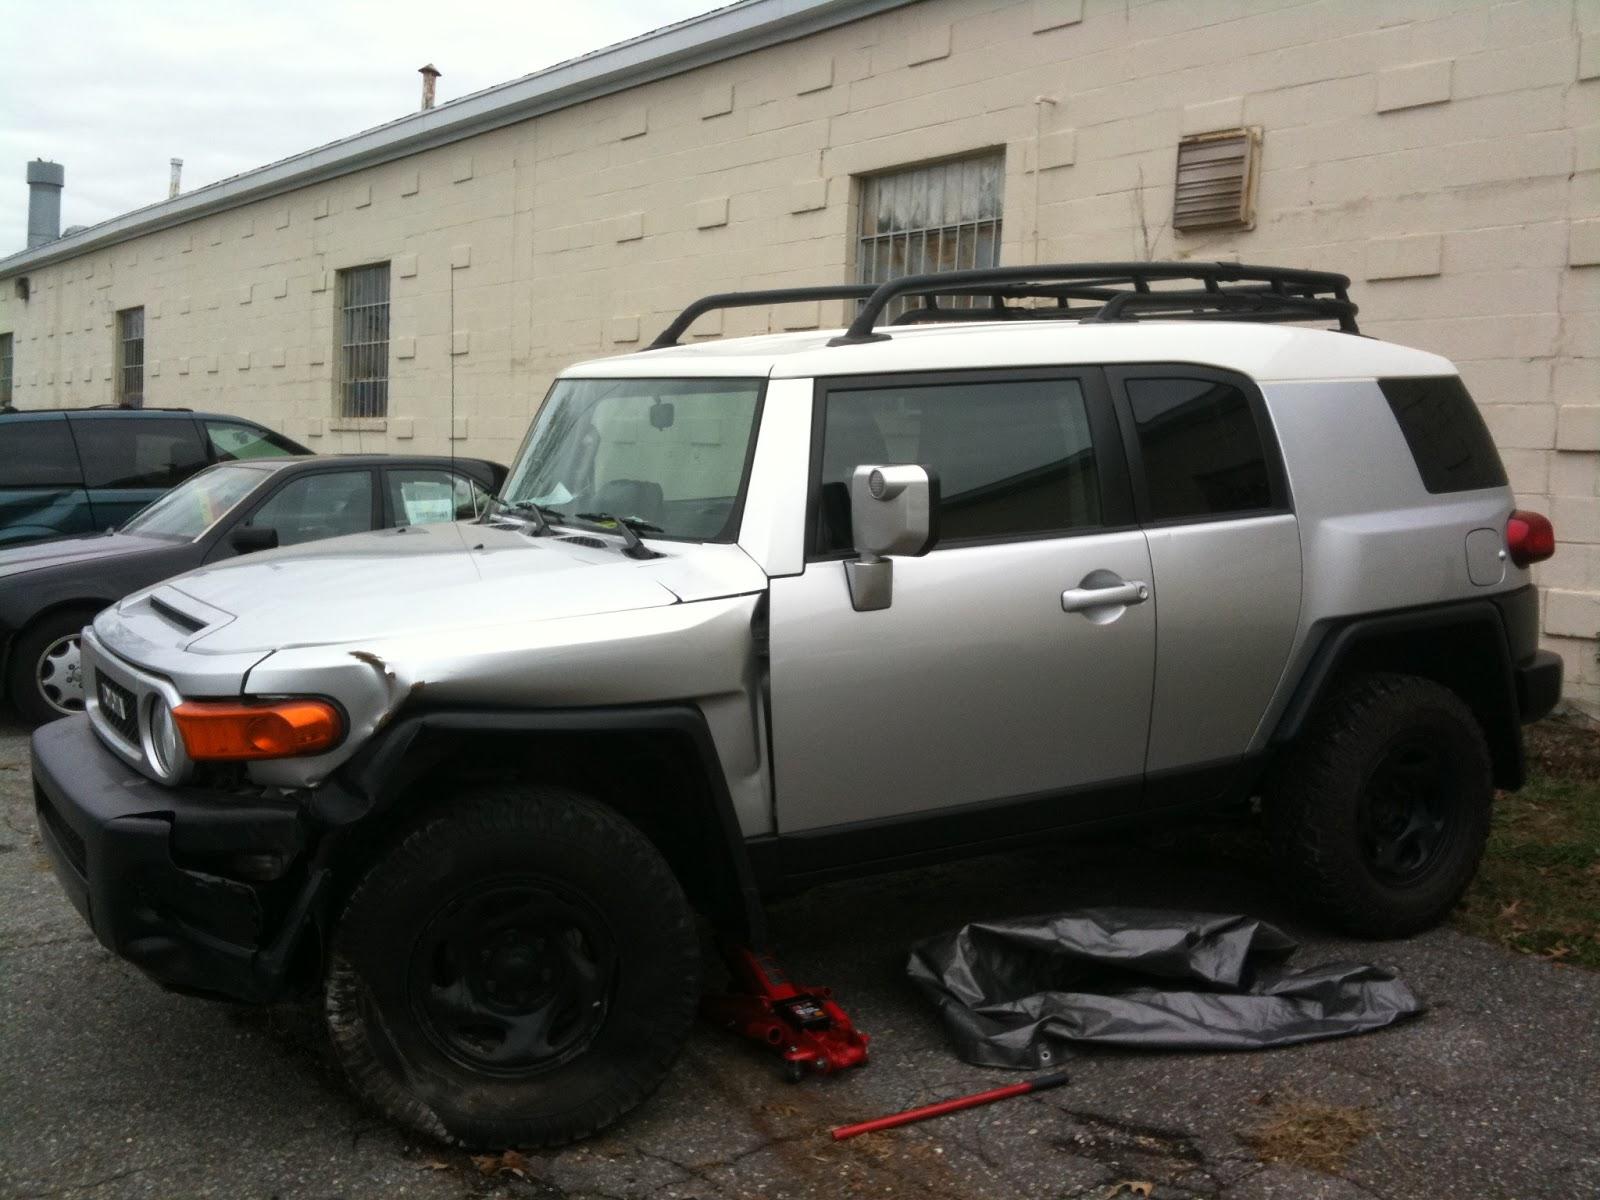 Fj Cruiser Mods : Toyota fj cruiser modifications mods information